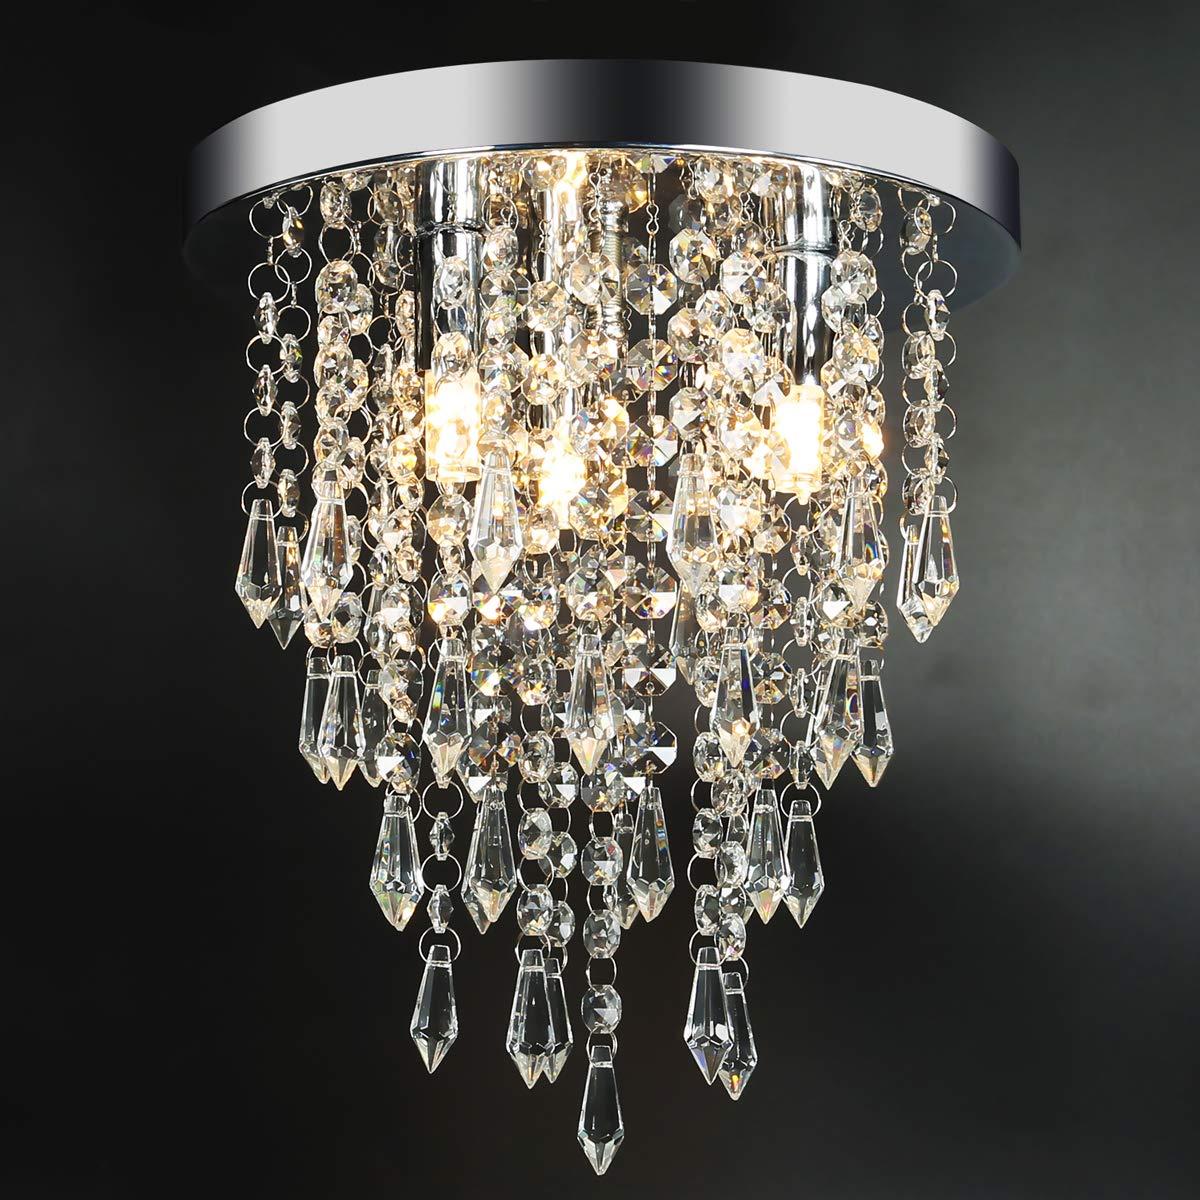 3 Lights Mini Crystal Flushmount Chandelier Fixture,Hong-in Crystal Ceiling Lamp, H10.4'' X W9.84'', Elegant Modern Flush Mount Ceiling Light for Bedroom, Hallway, Bar, Living Room, Dining Room, Chrome by Hong-in